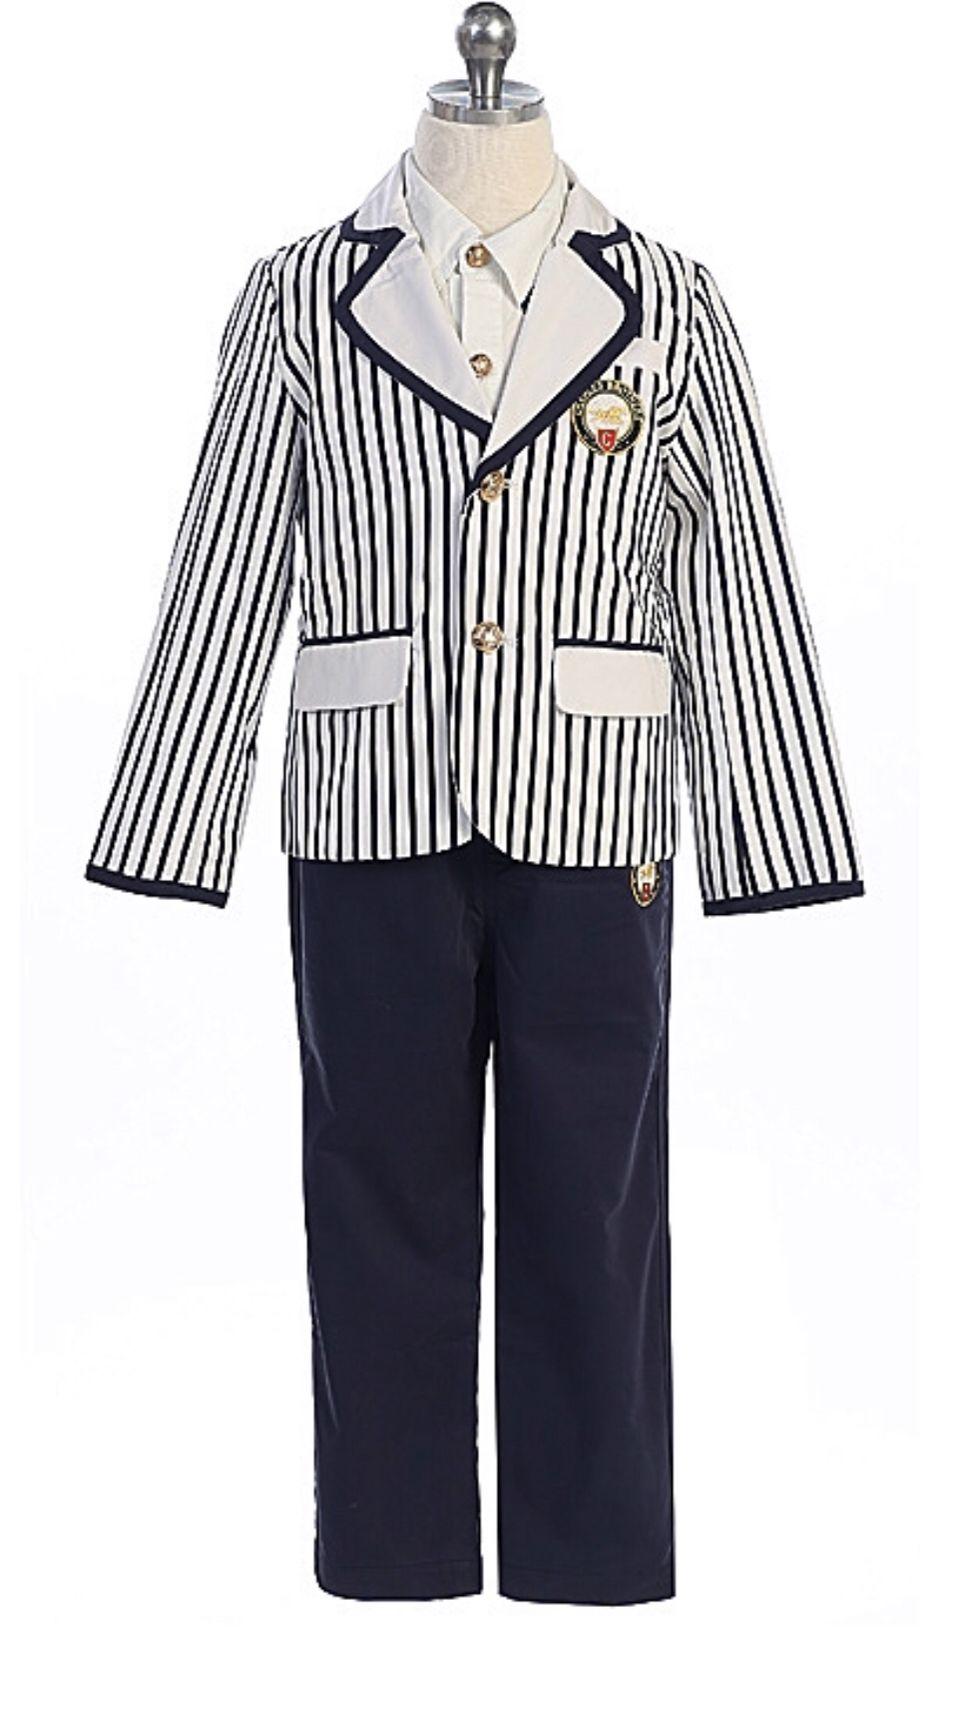 39924fdf61f Couture high quality luxury brand designer children's clothing | Boy ...